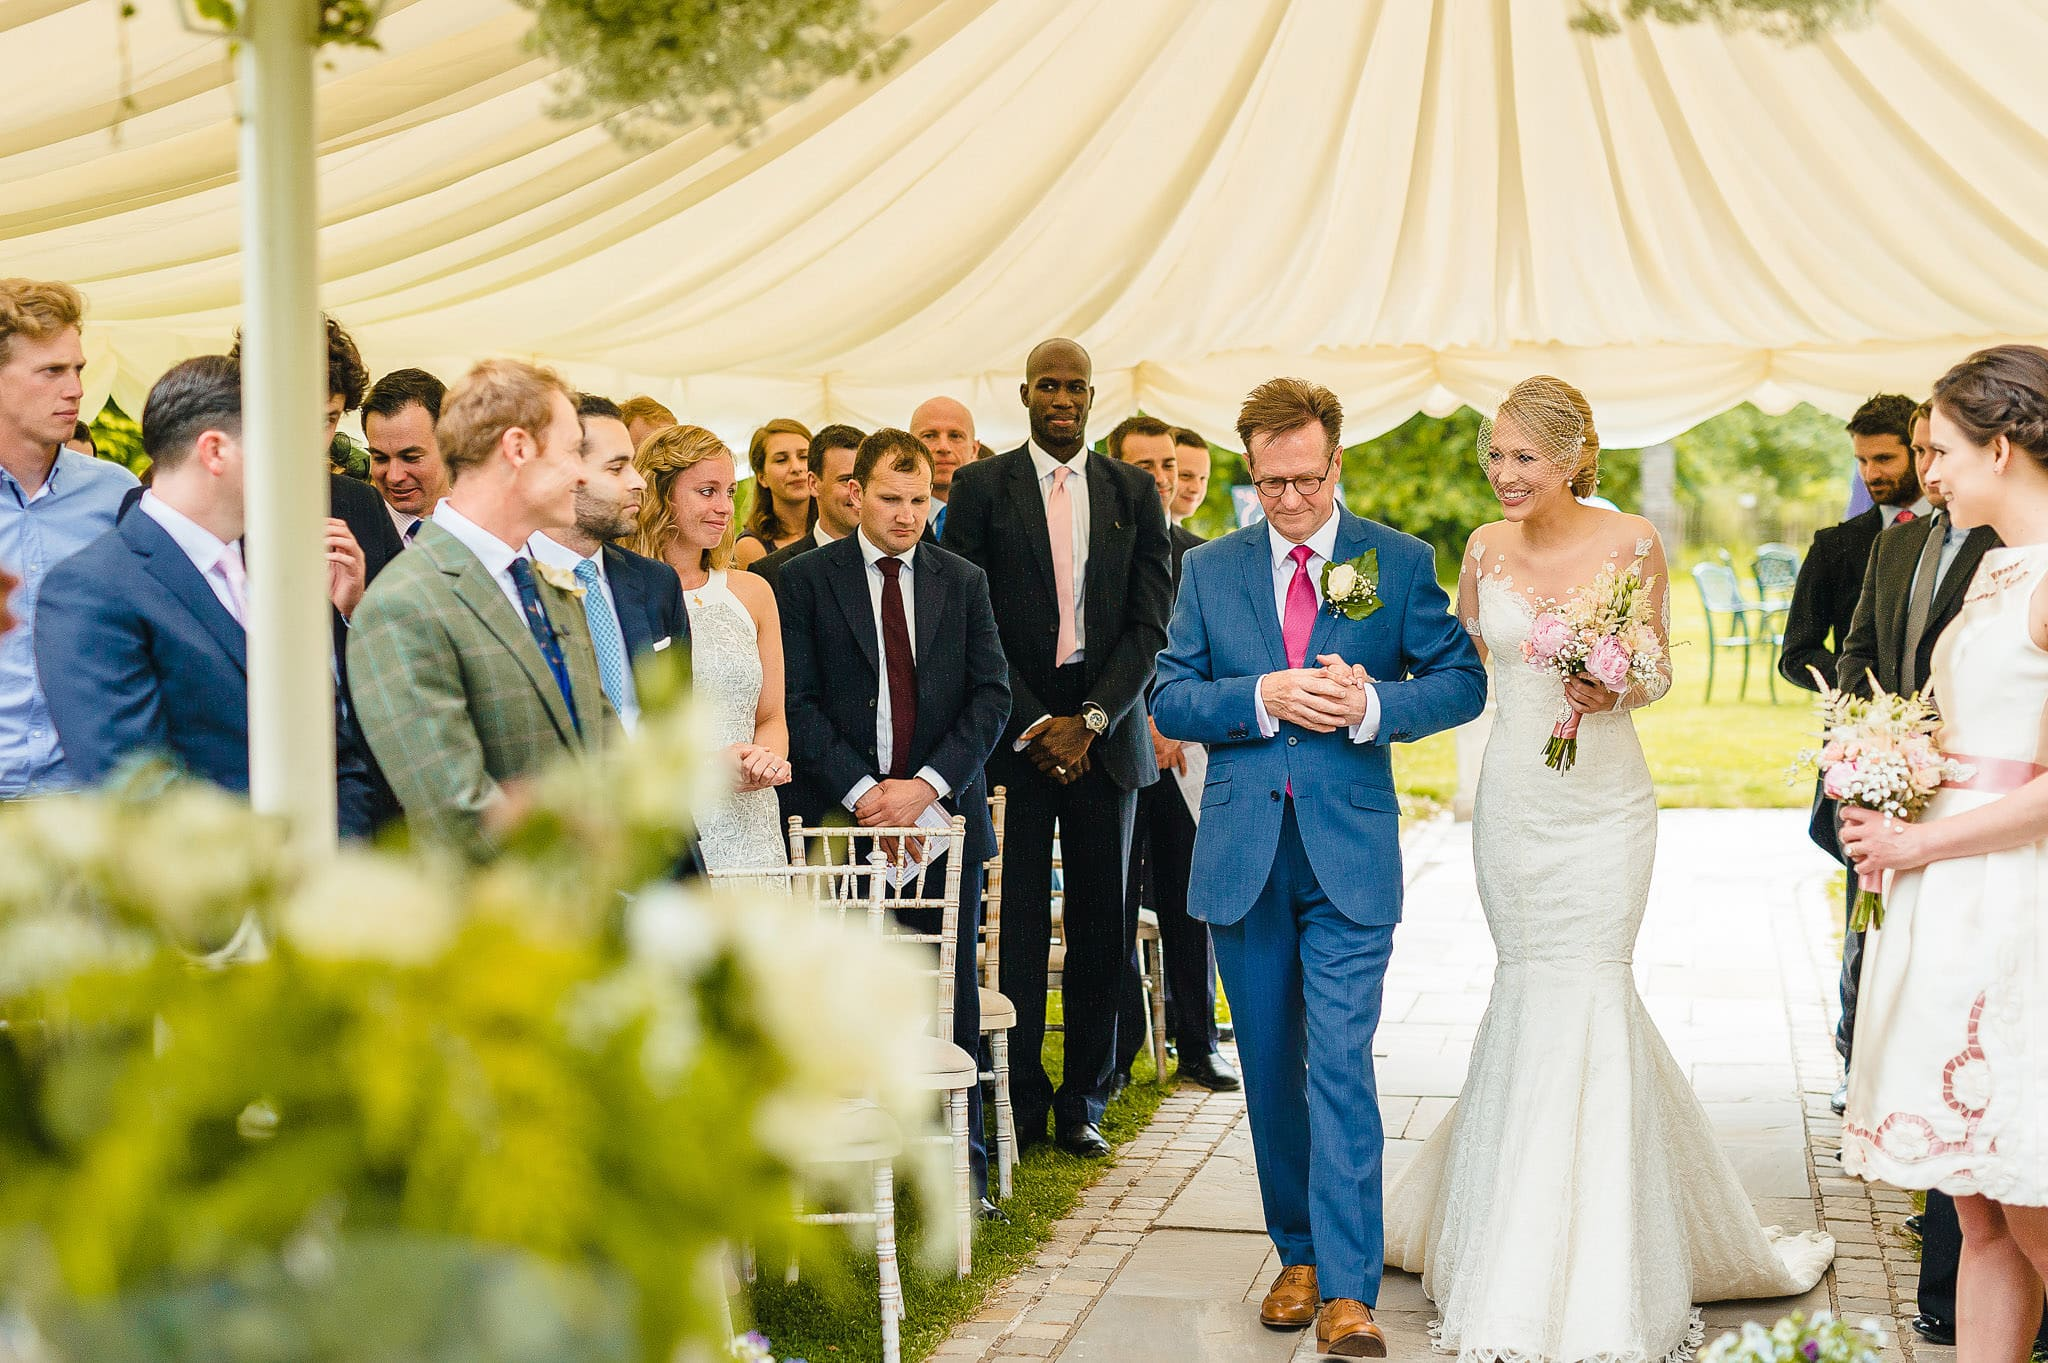 Lemore Manor Wedding Photographer | Hannah and Angus 21